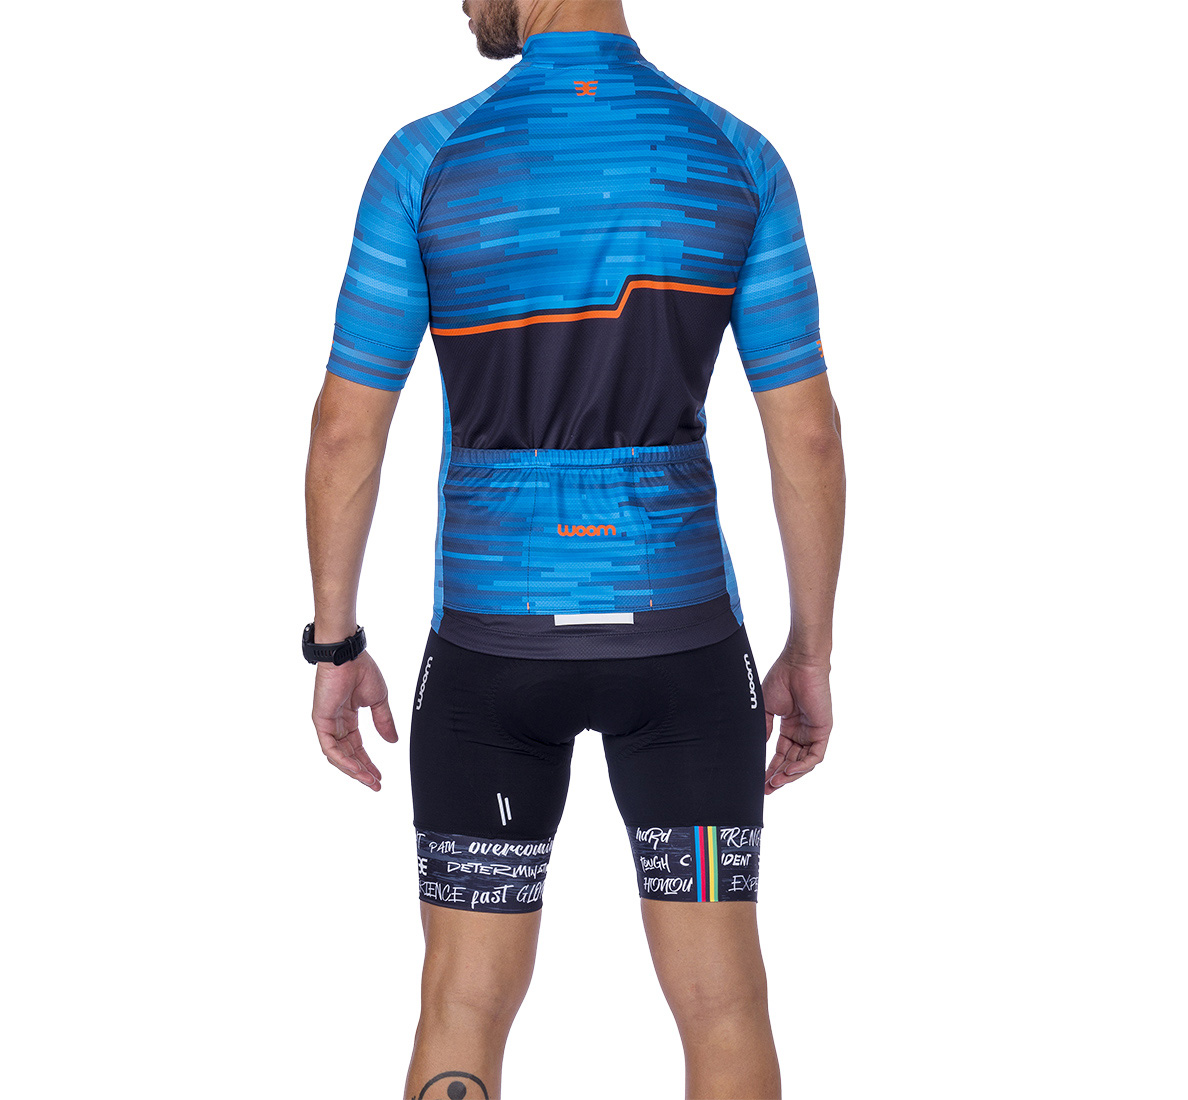 Camisa Ciclismo Smart Ocean Masc - 2021